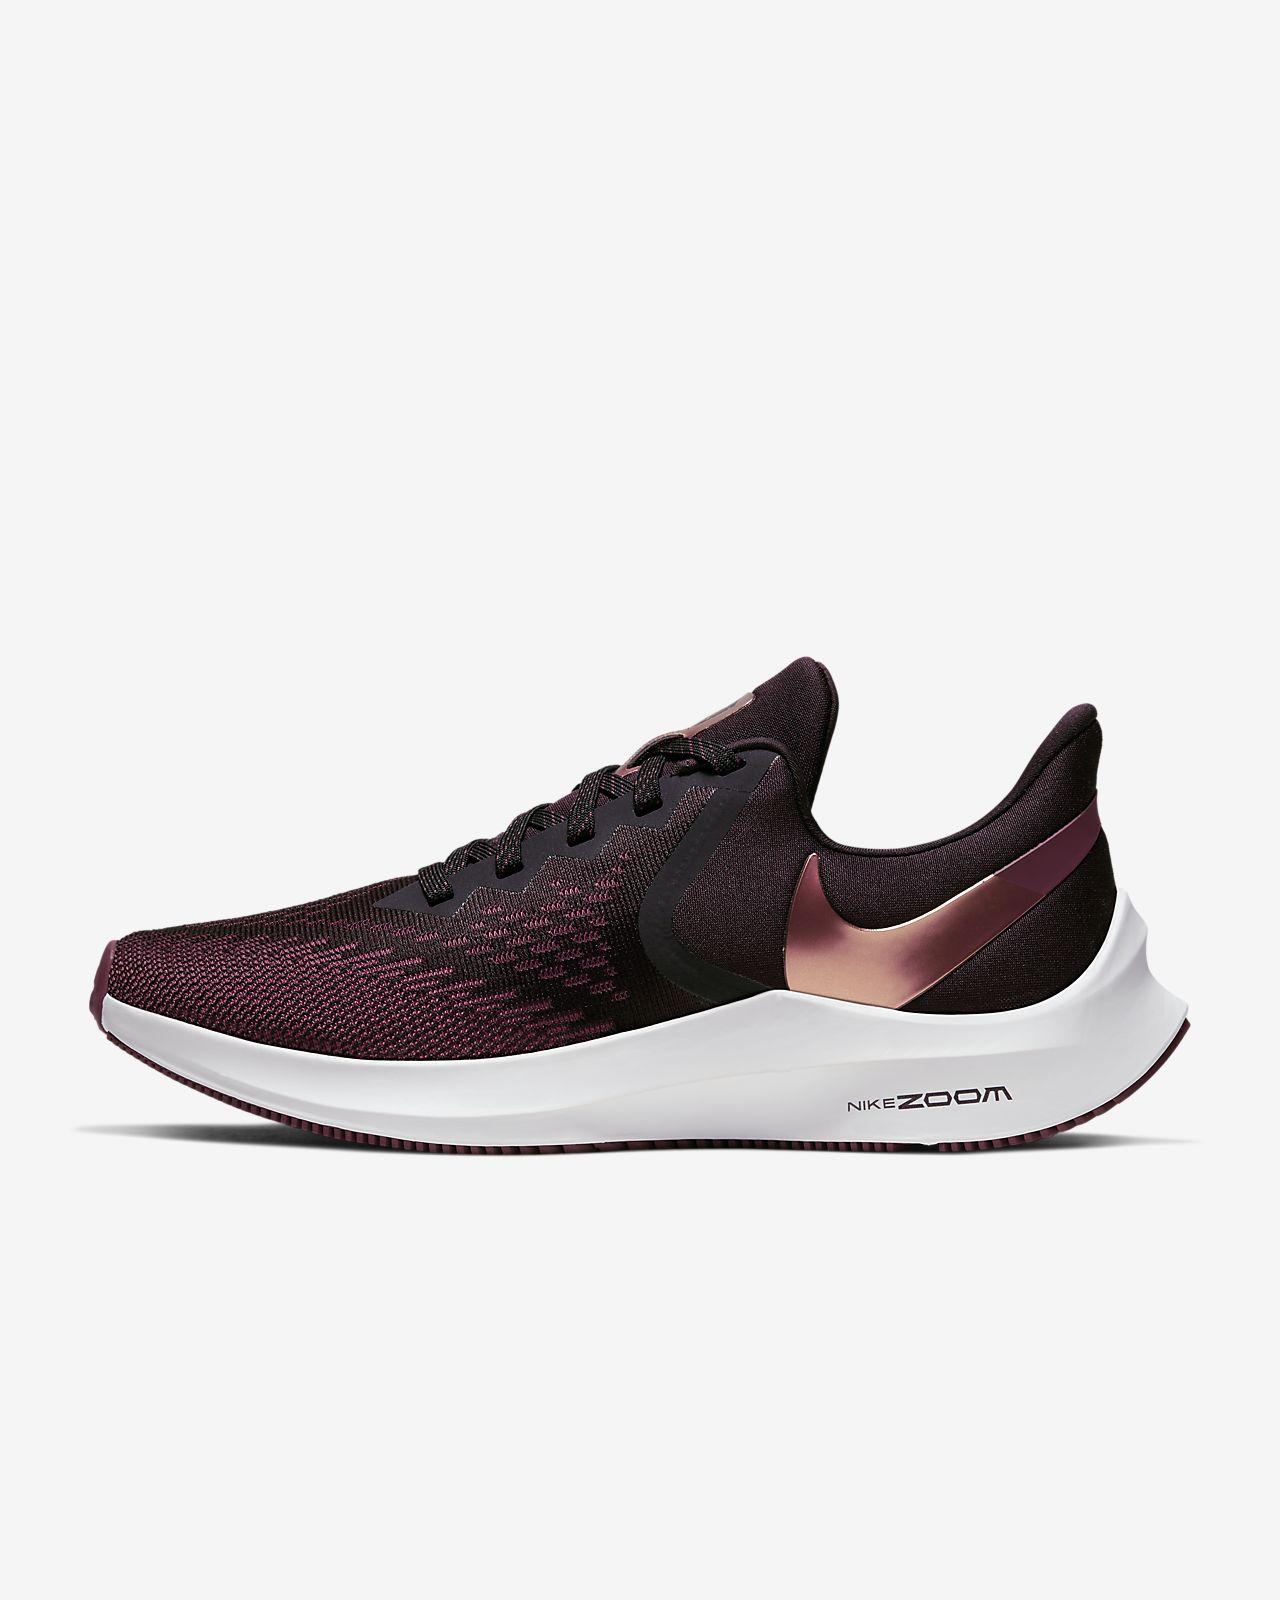 Nike Air Zoom Winflo 6 Icon Clash Women's Running Shoe